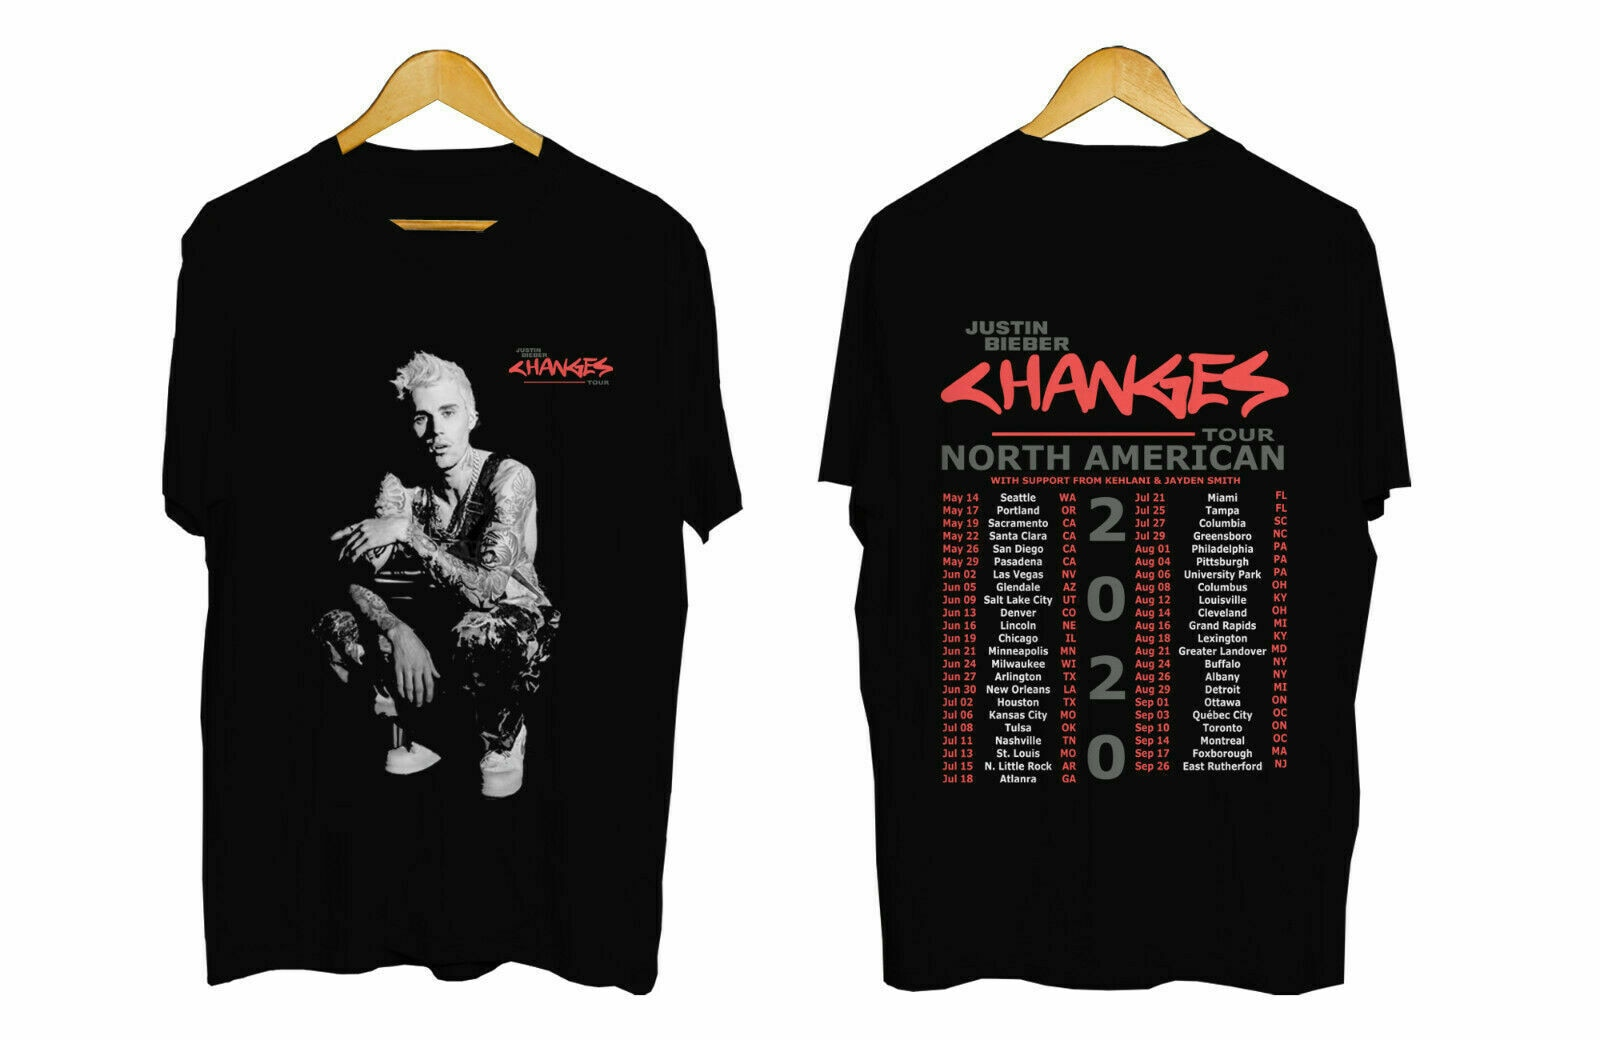 Justin Bieber Tour 2020 camiseta Justin Bieber delicioso camiseta Merch las fechas de la gira